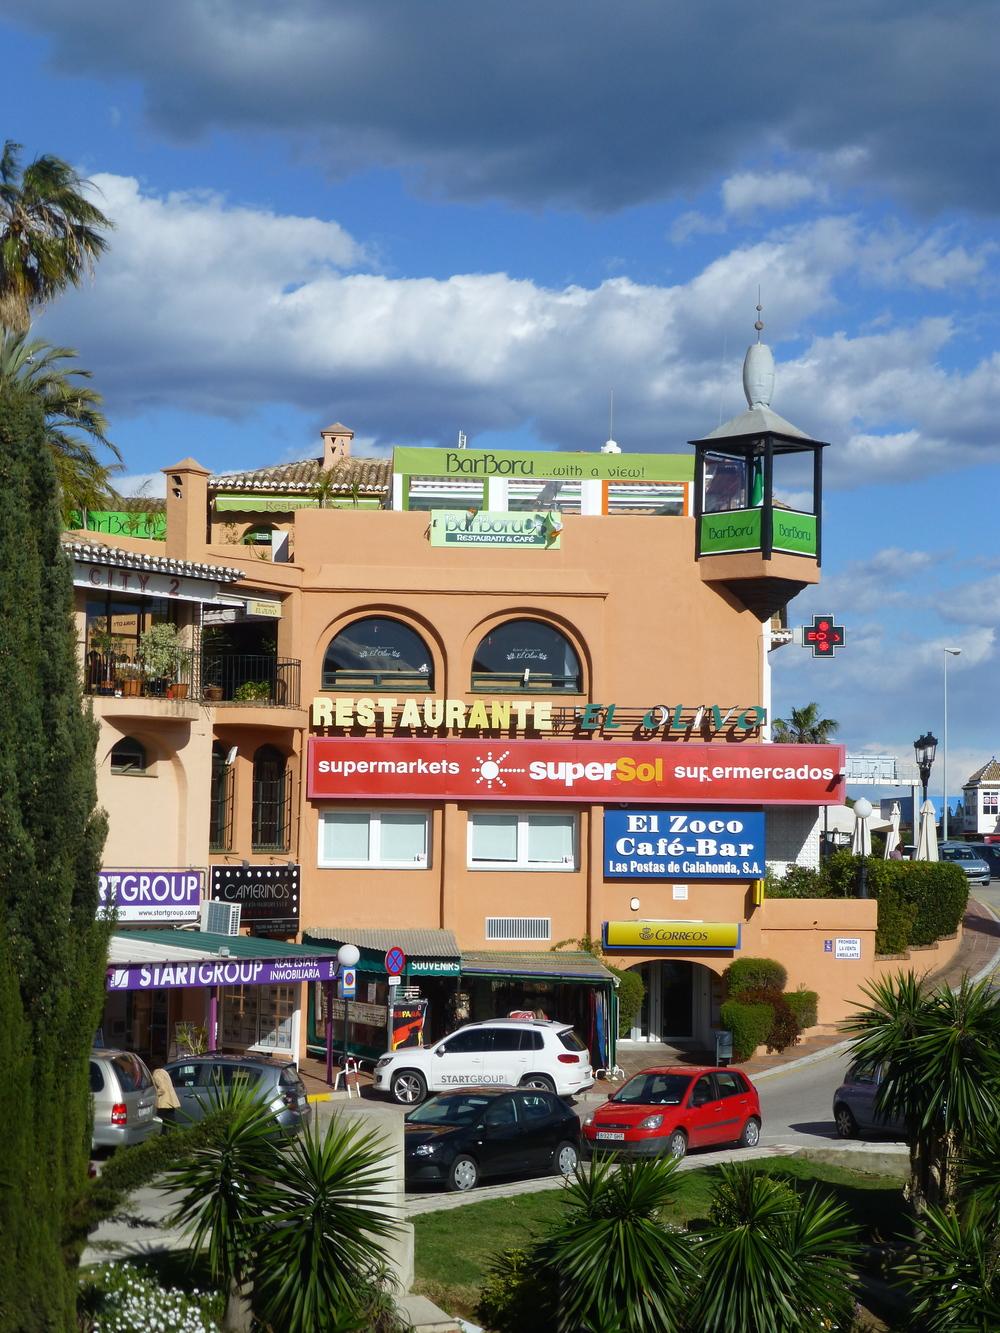 Barboru Restaurant, Bar & Terrace Calahonda